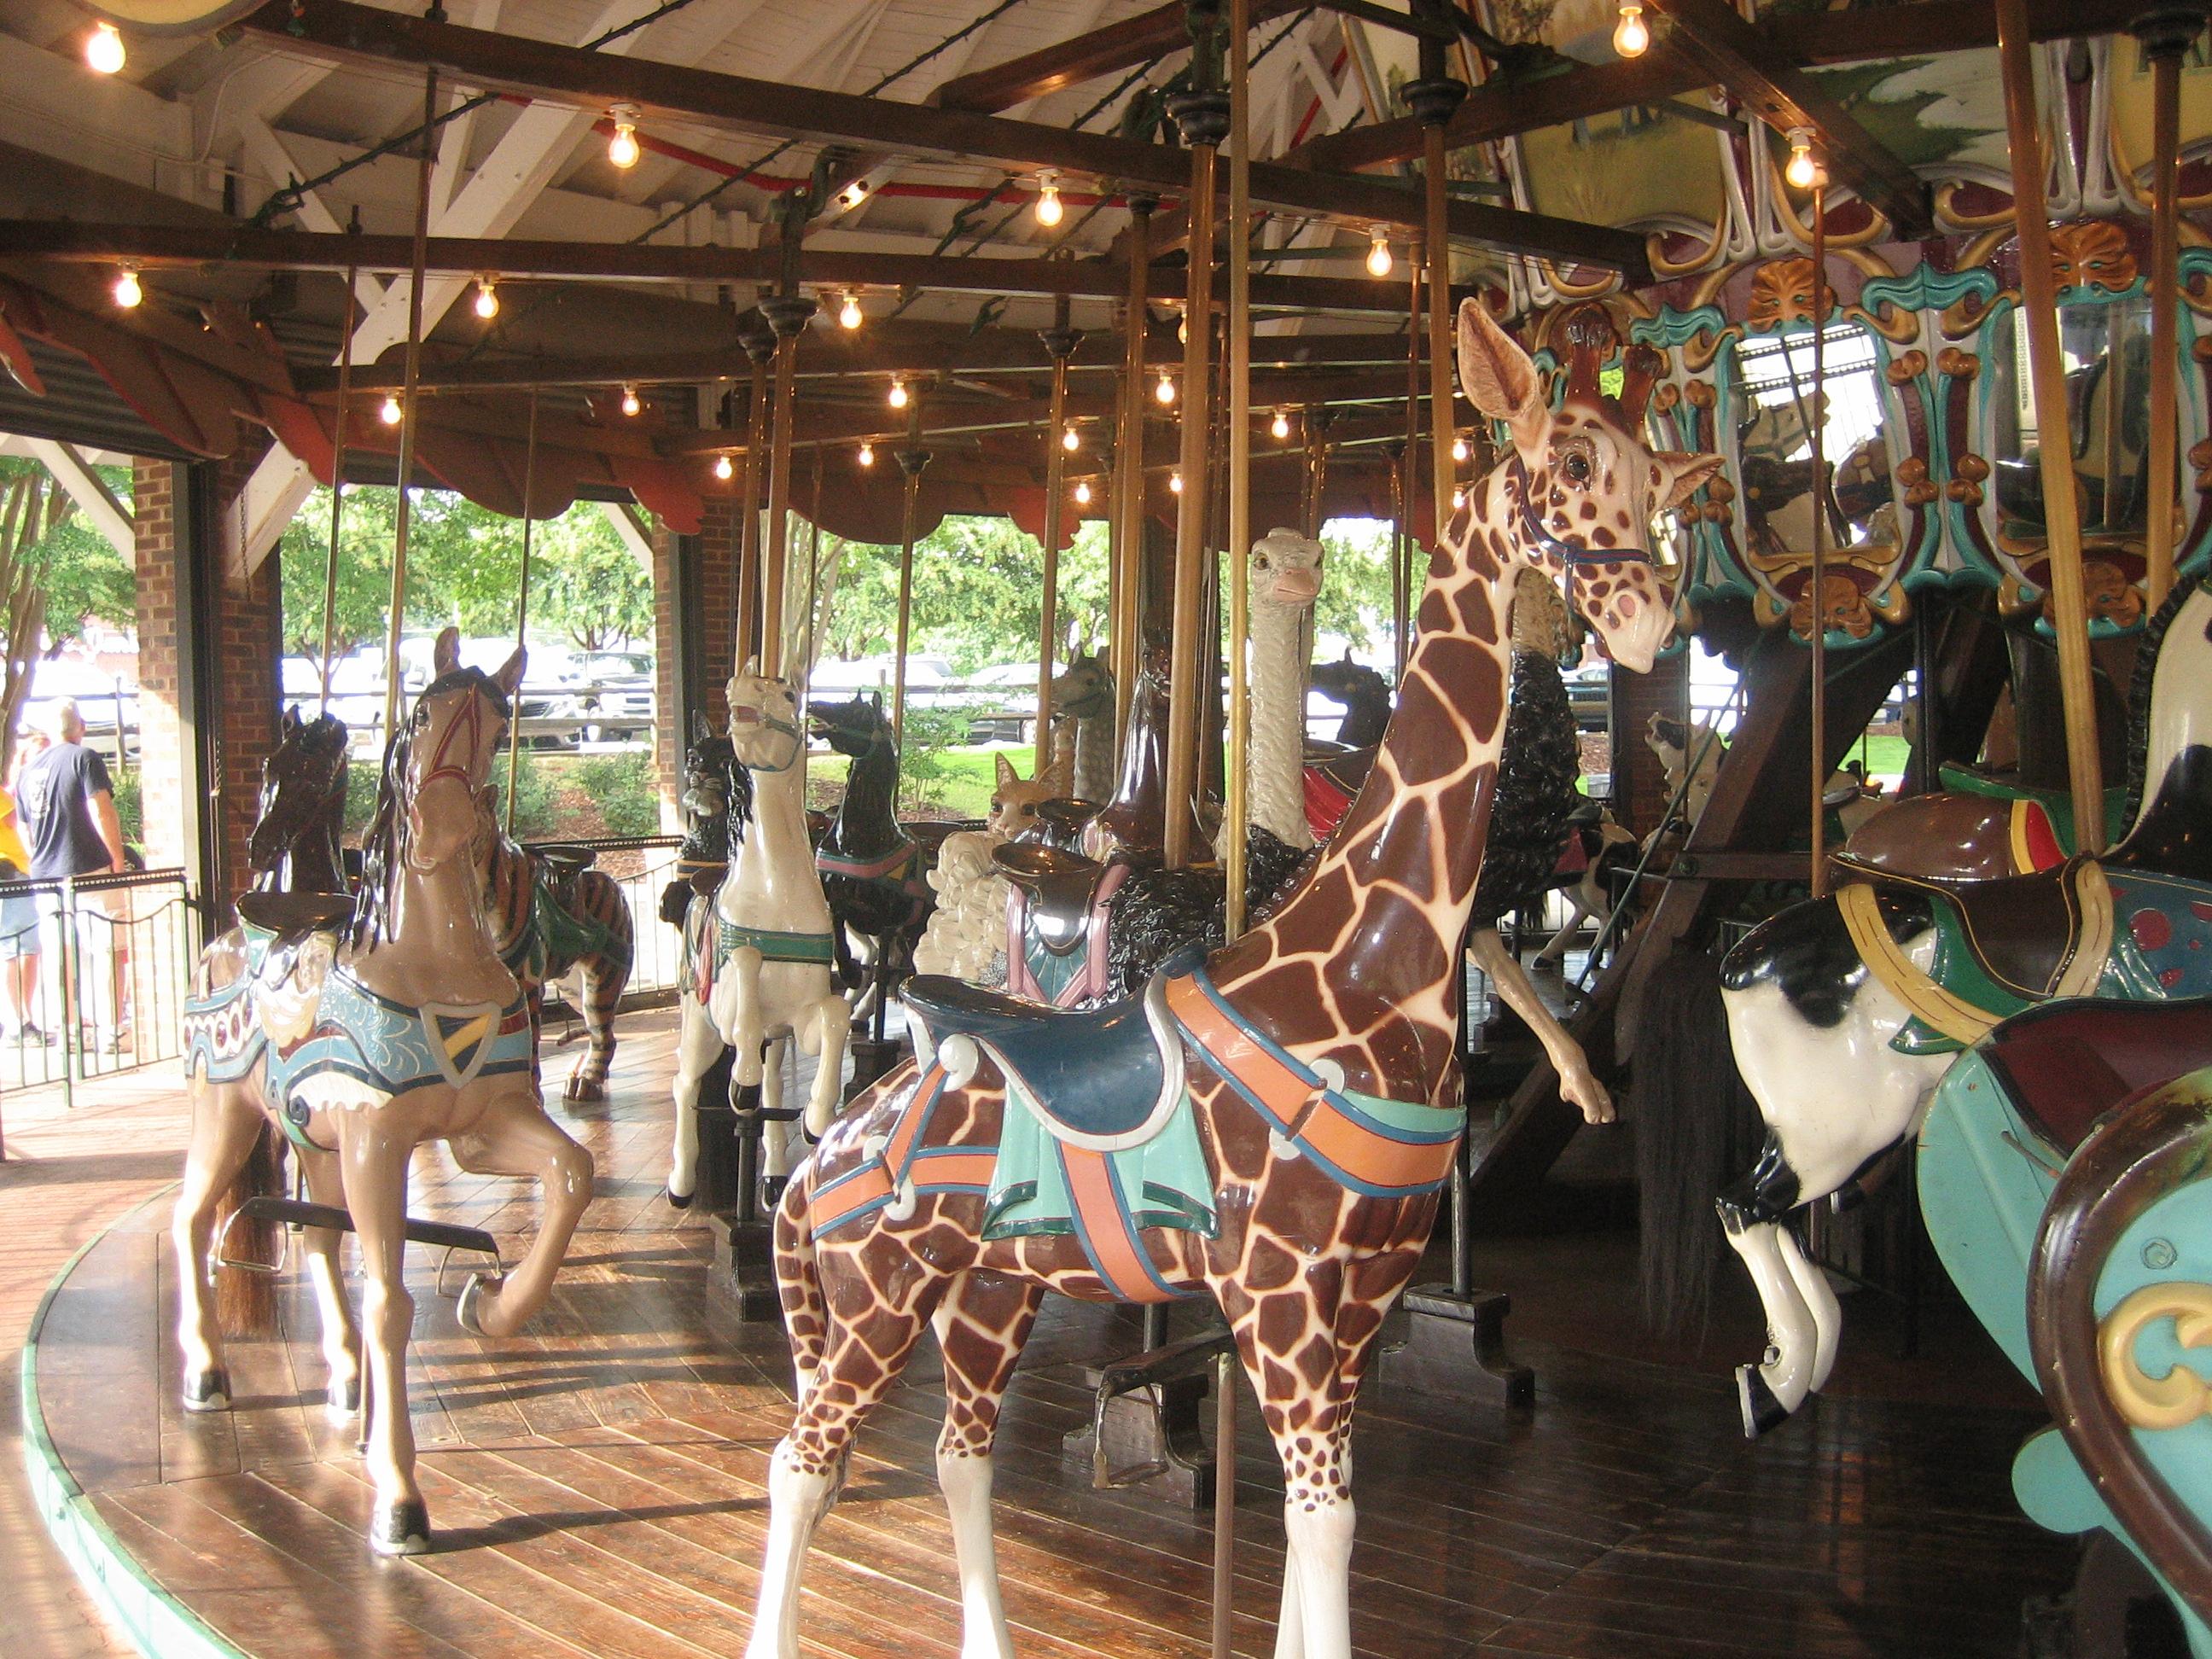 100 year old carousel in City Park, Burlington NC